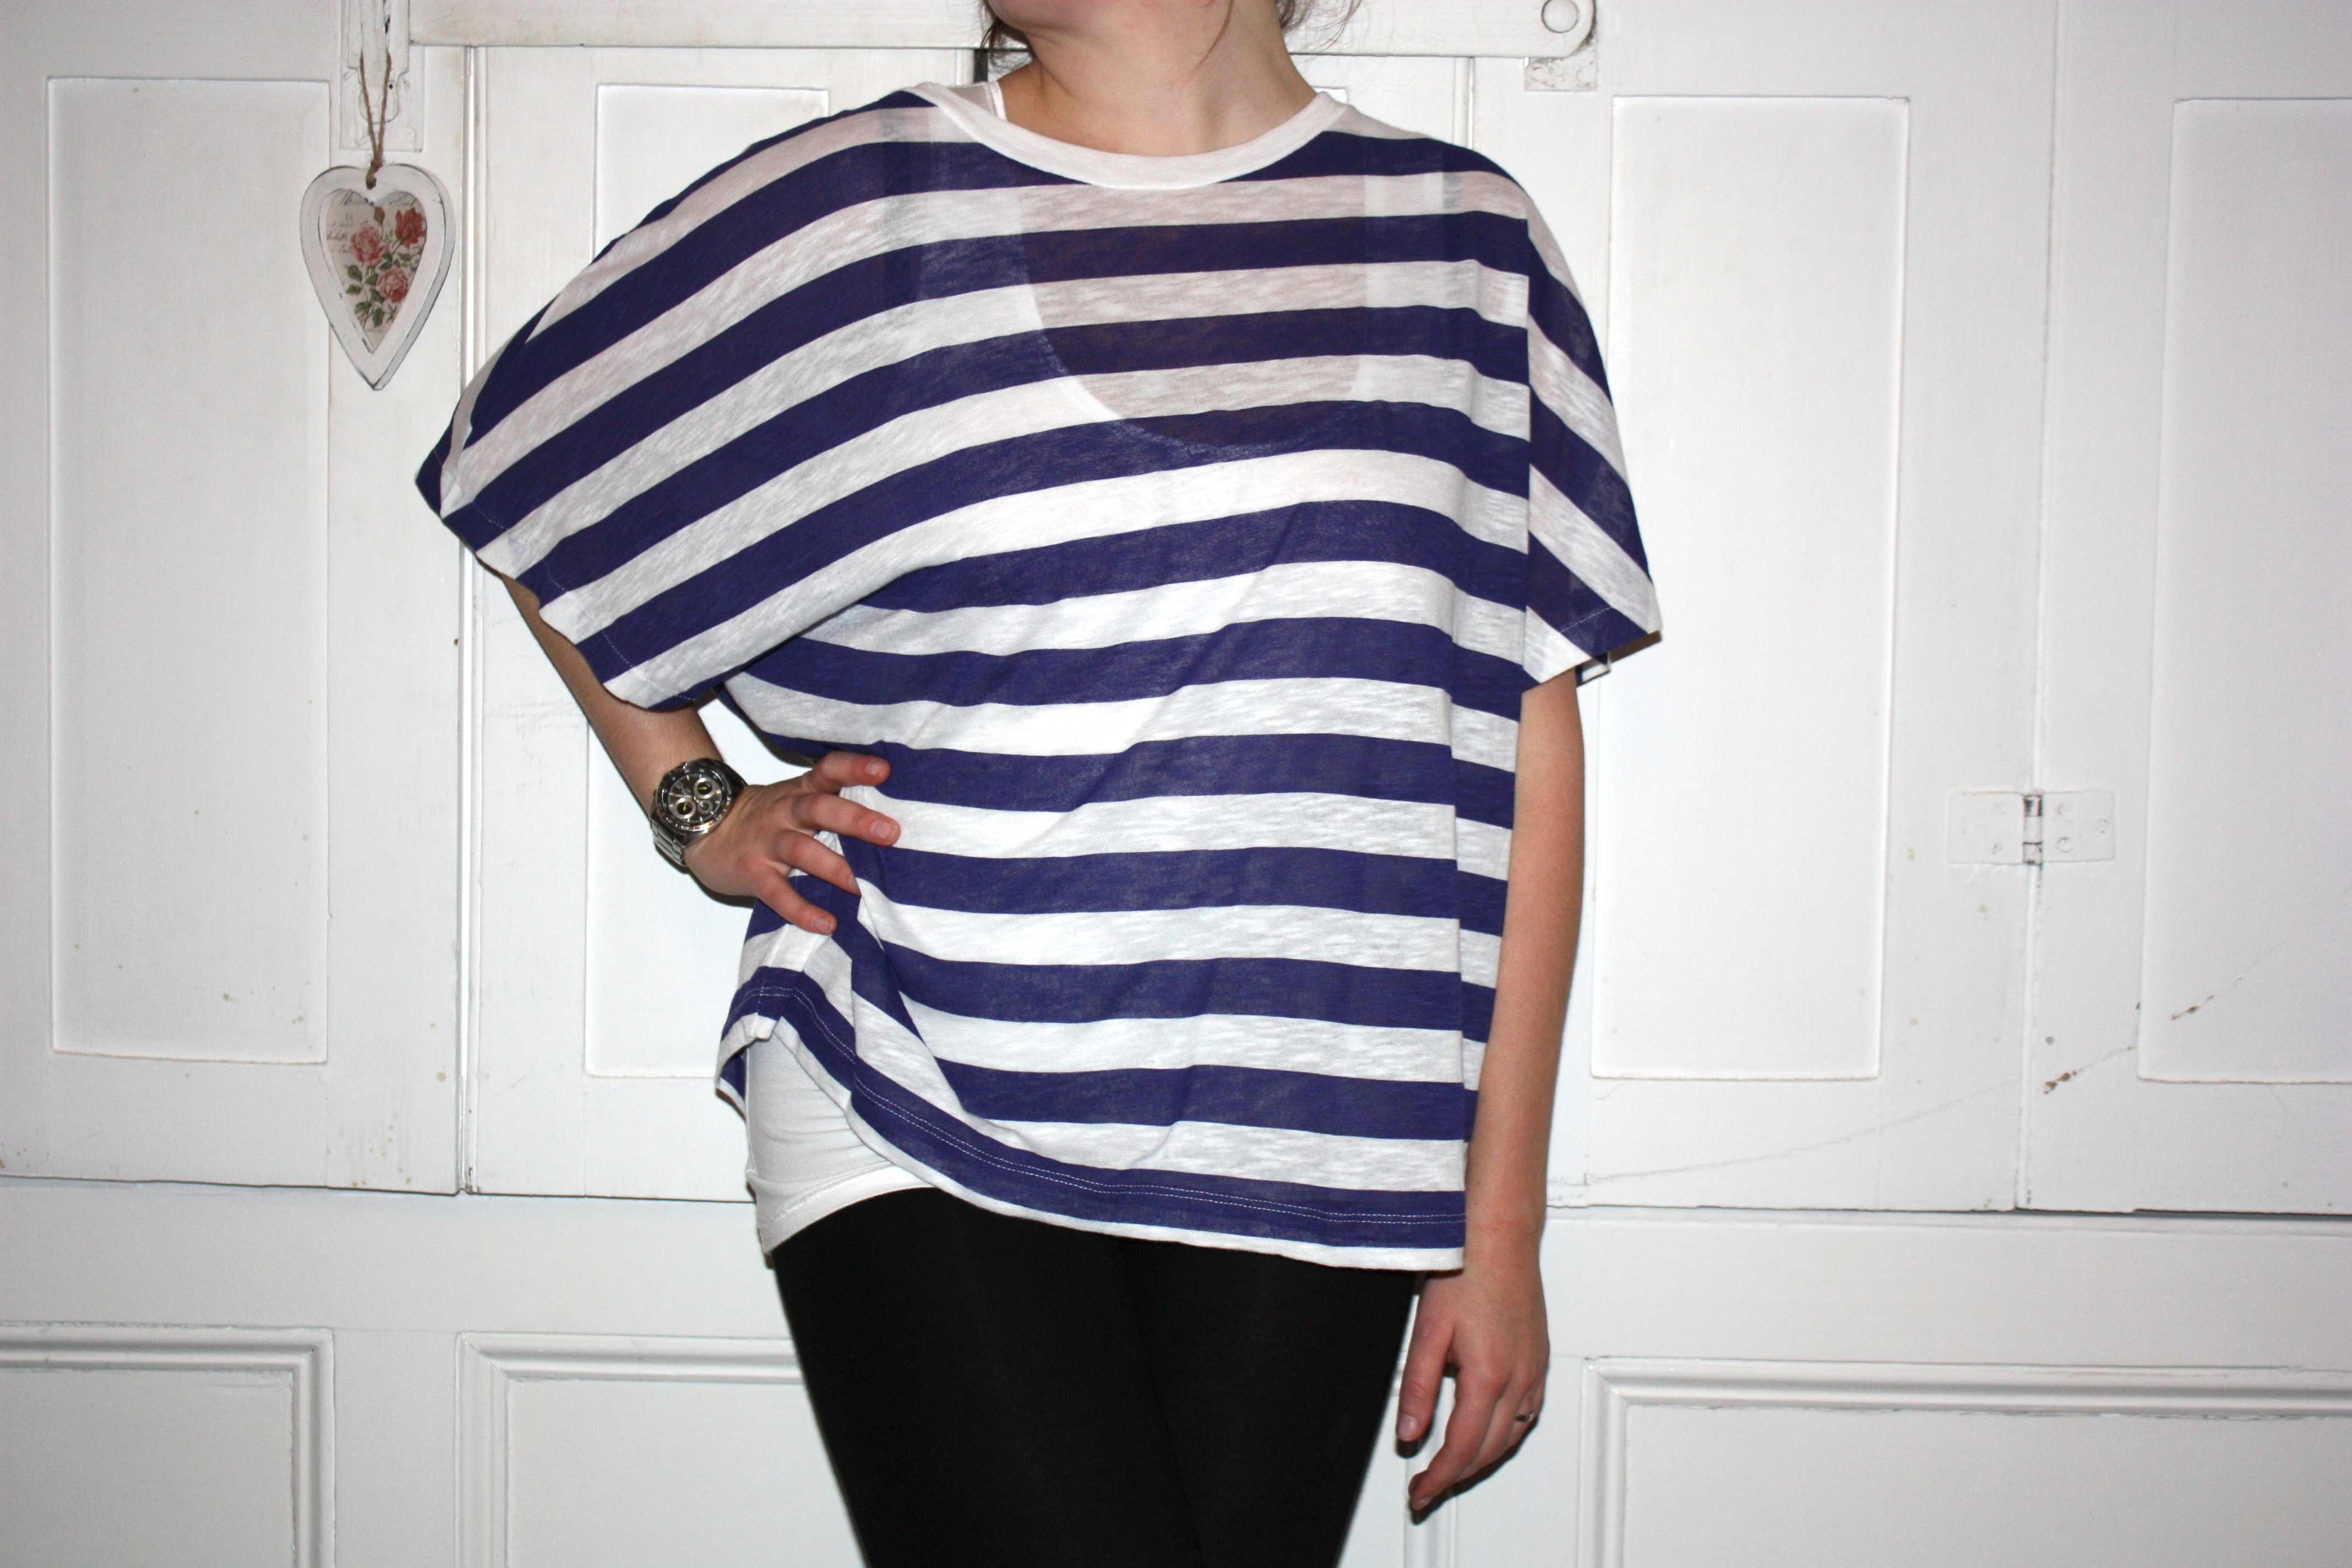 Striped Zara tee